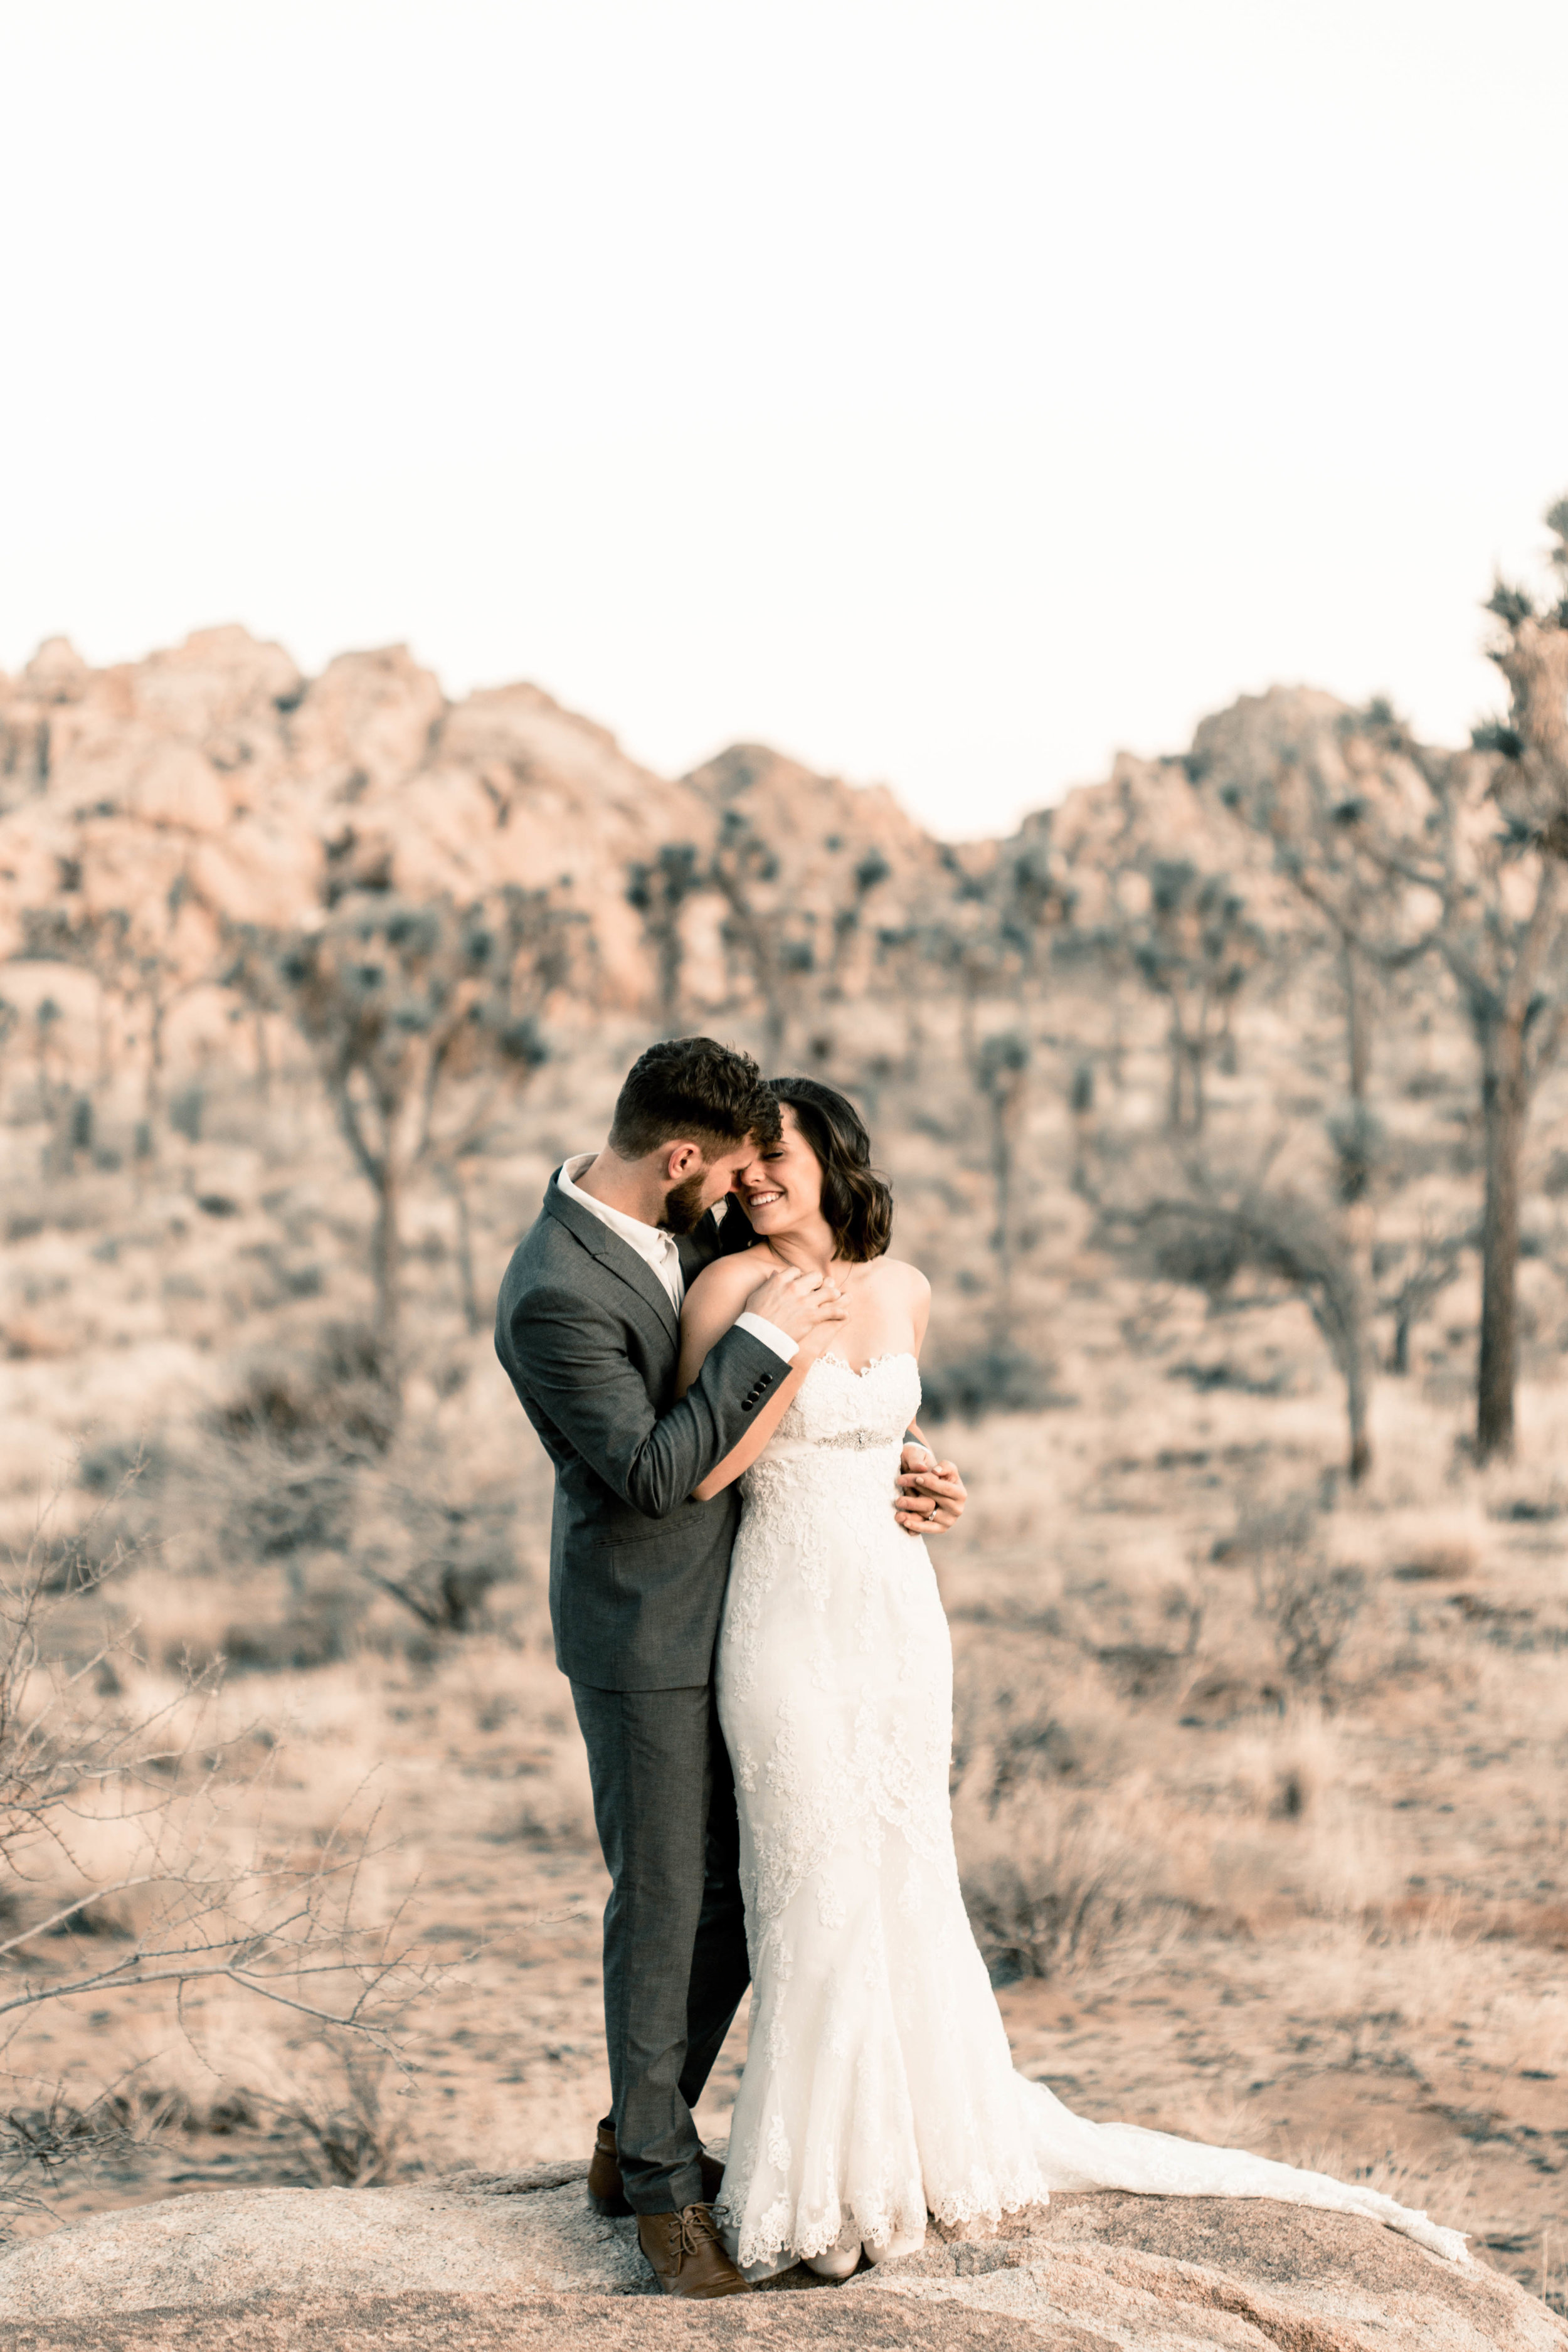 nicole-daacke-photography-joshua-tree-adventurous-elopement-wedding-national-park-wedding-photographer-adventure-wedding-adventurous-elopement-jtree-joshua-tree-national-park-wedding-photographer-intimate-weddings-golden-desert-love-39.jpg